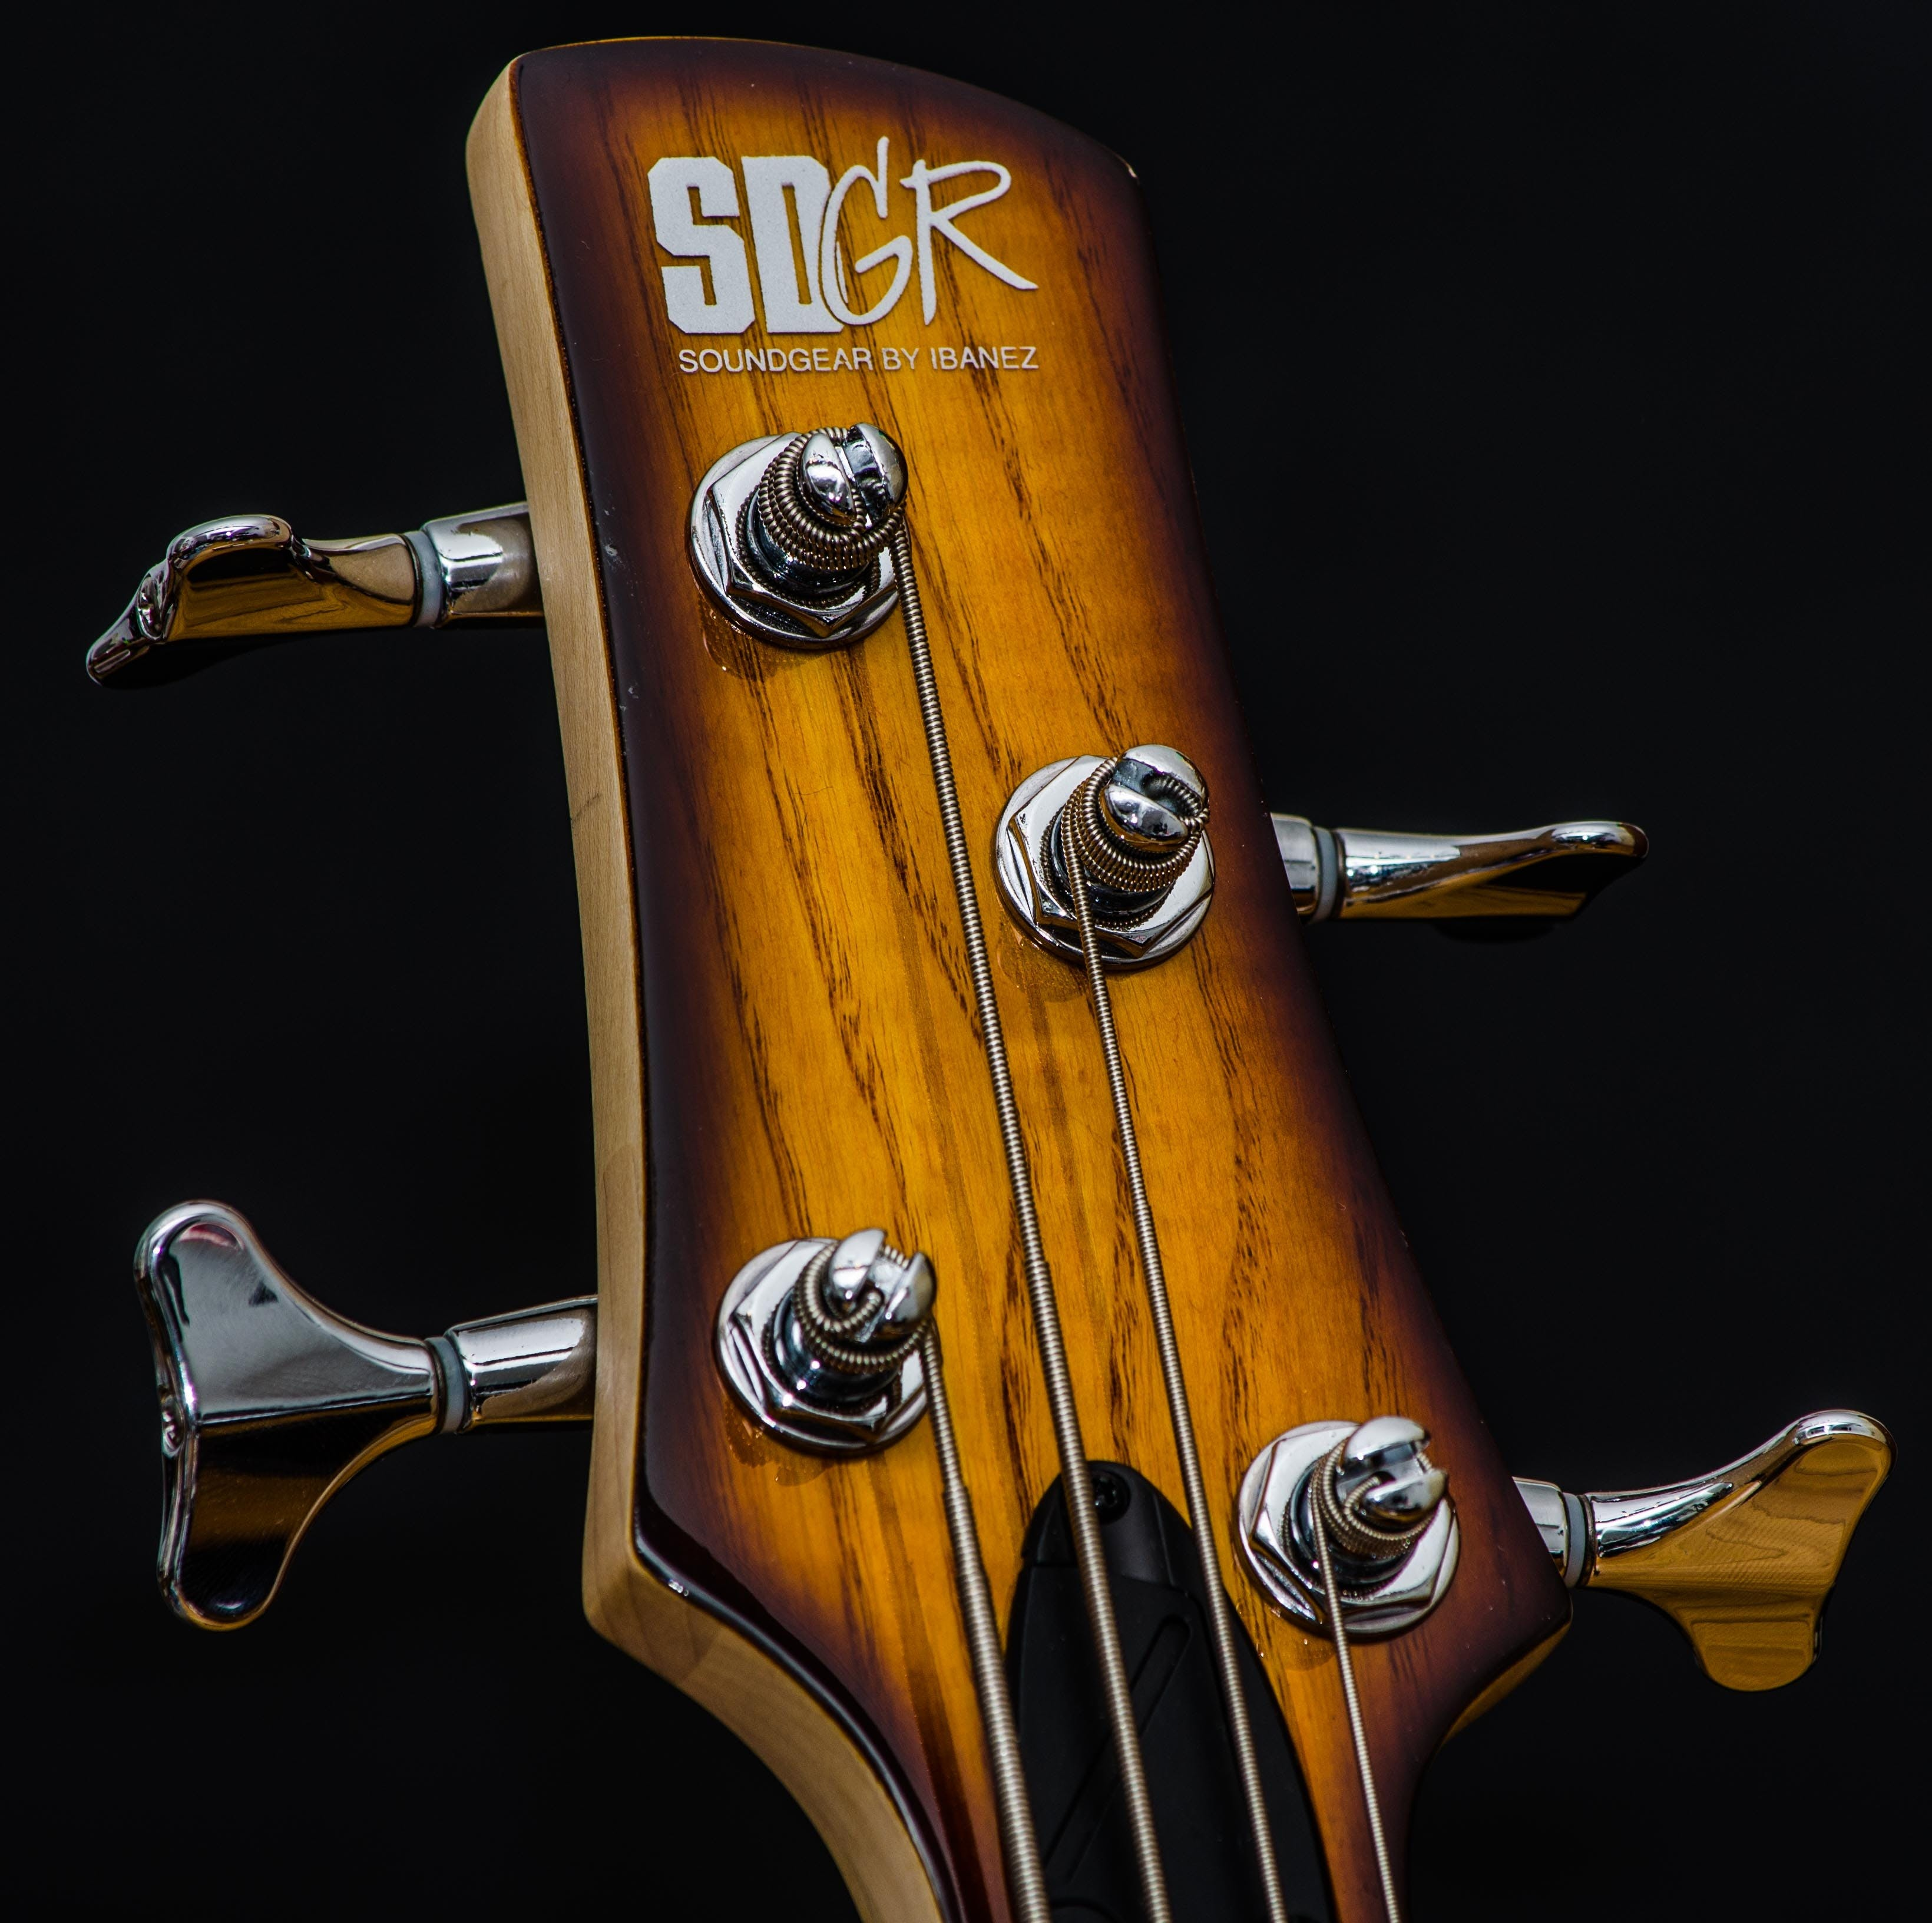 Brown Sdgr Guitar Headstock